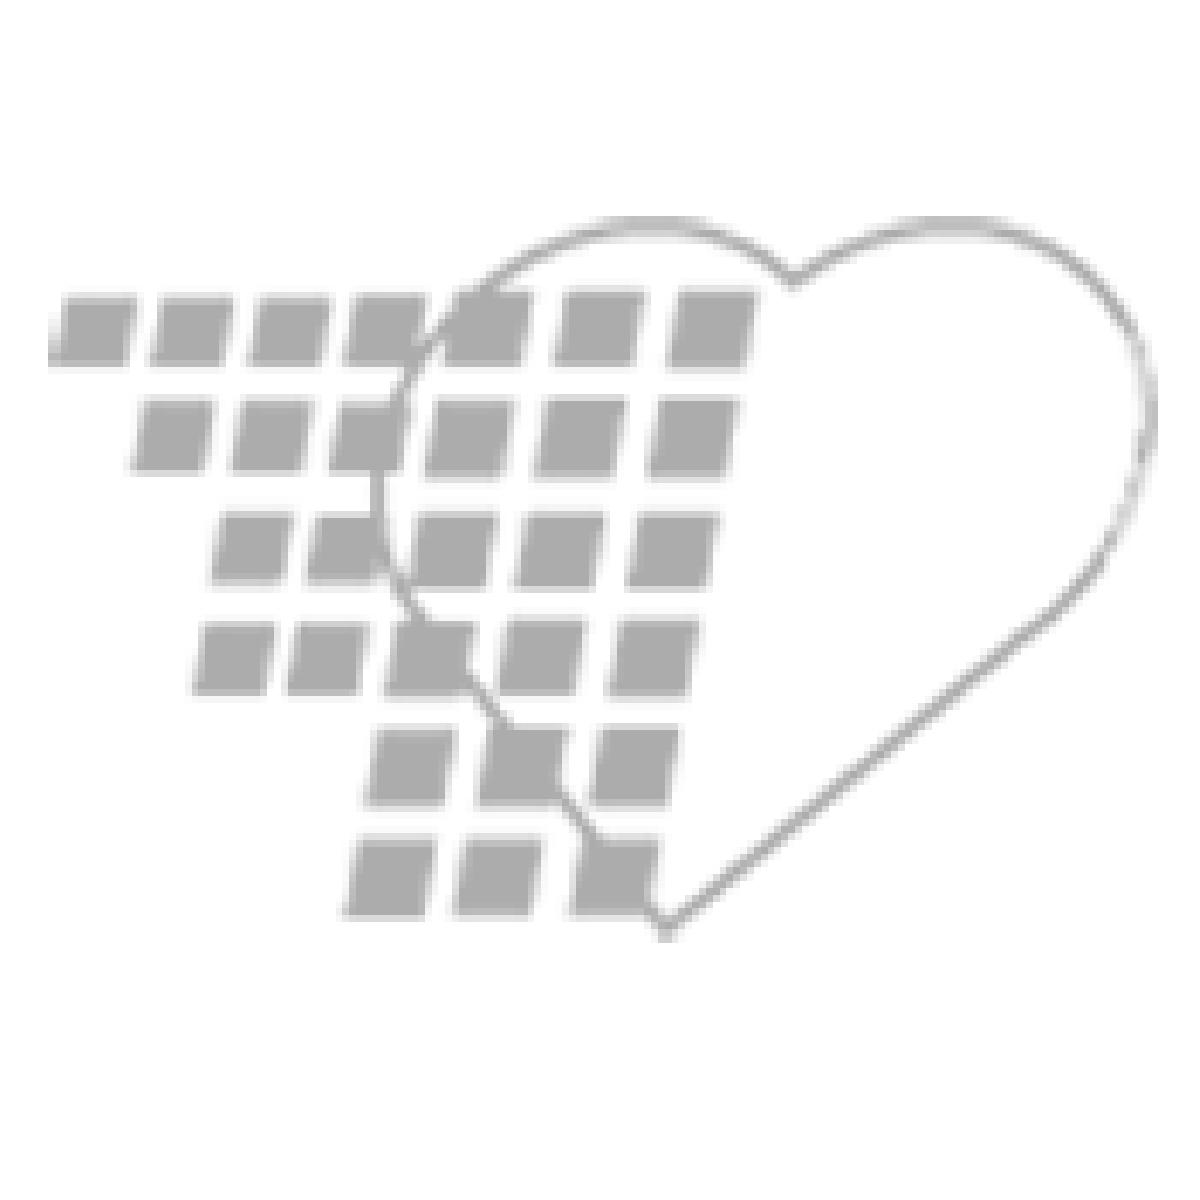 05-49-6197 - Salem Sump   Anti-Reflux Valve